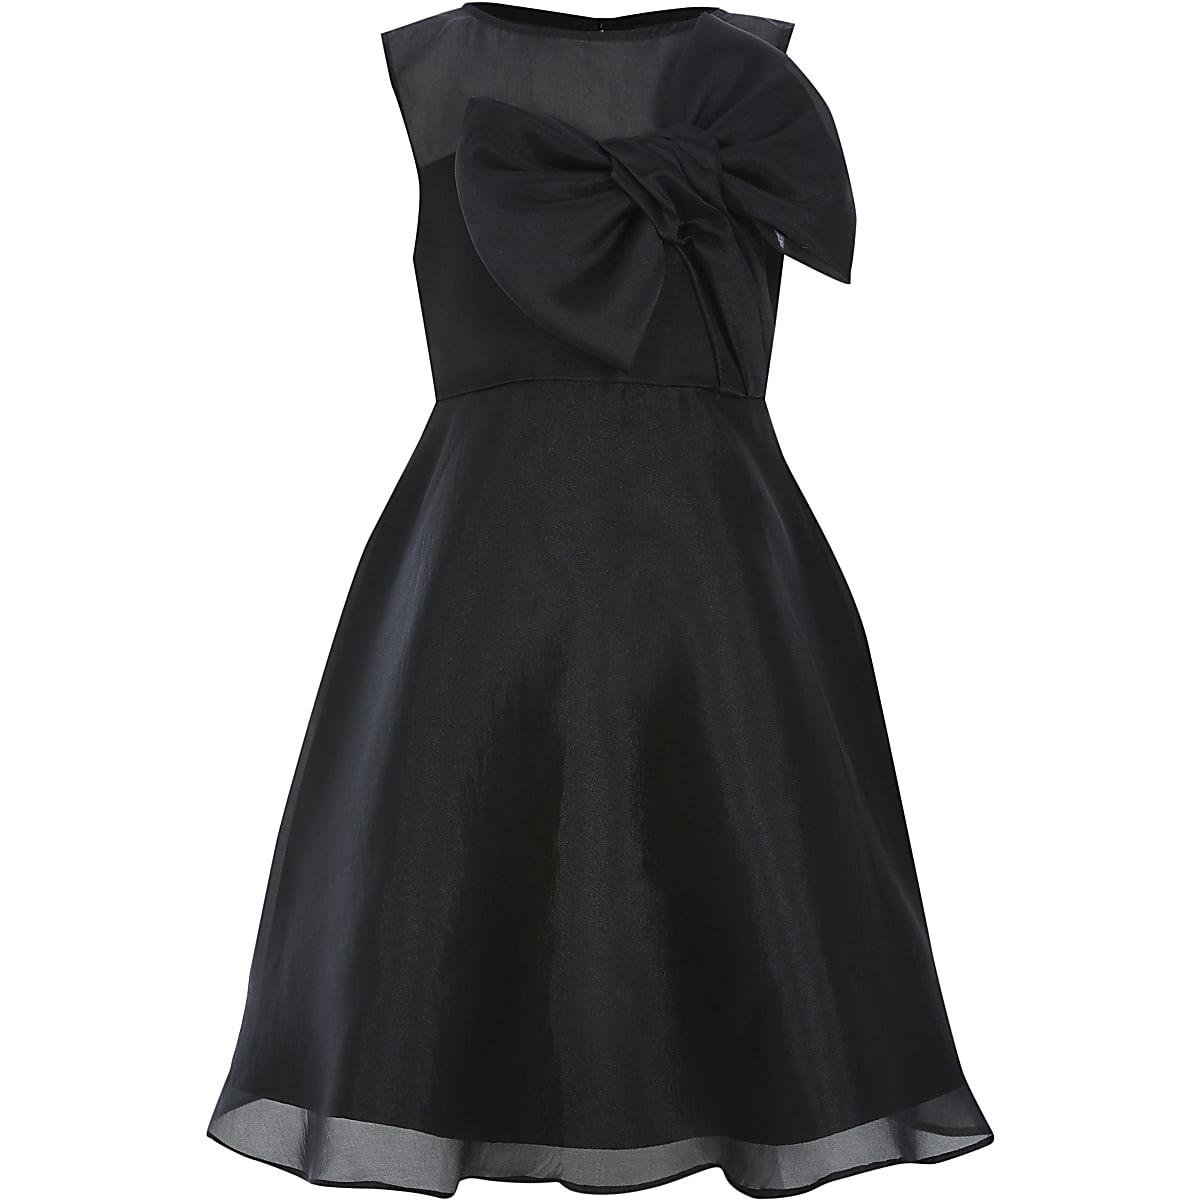 Girls Chi Chi black organza bow dress